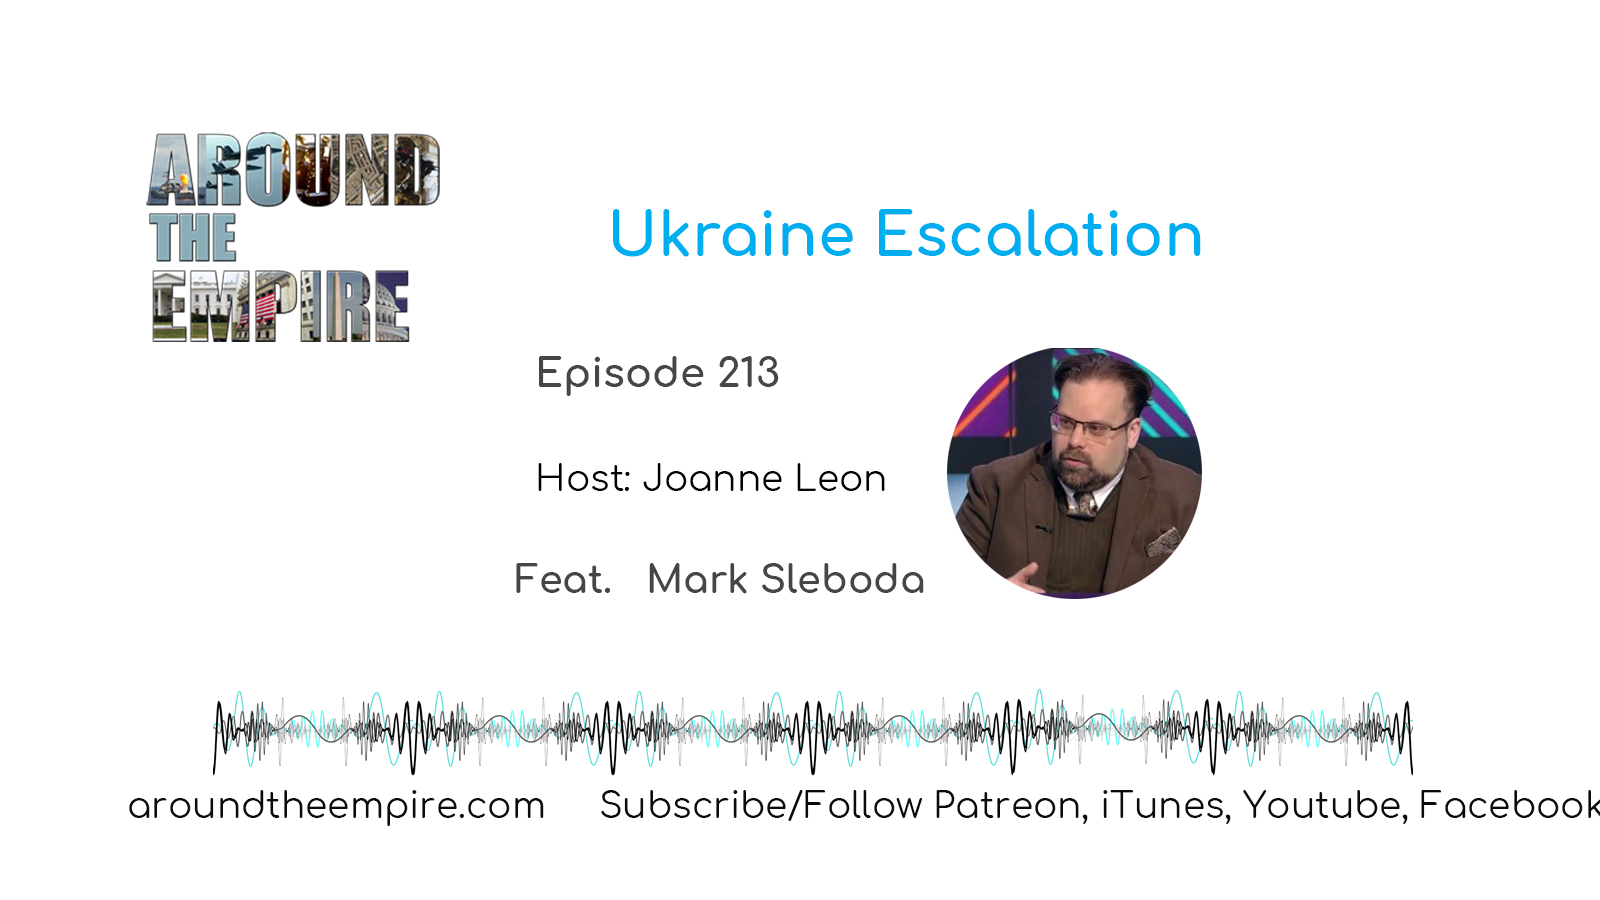 Ep 213 Ukraine Escalation feat Mark Sleboda